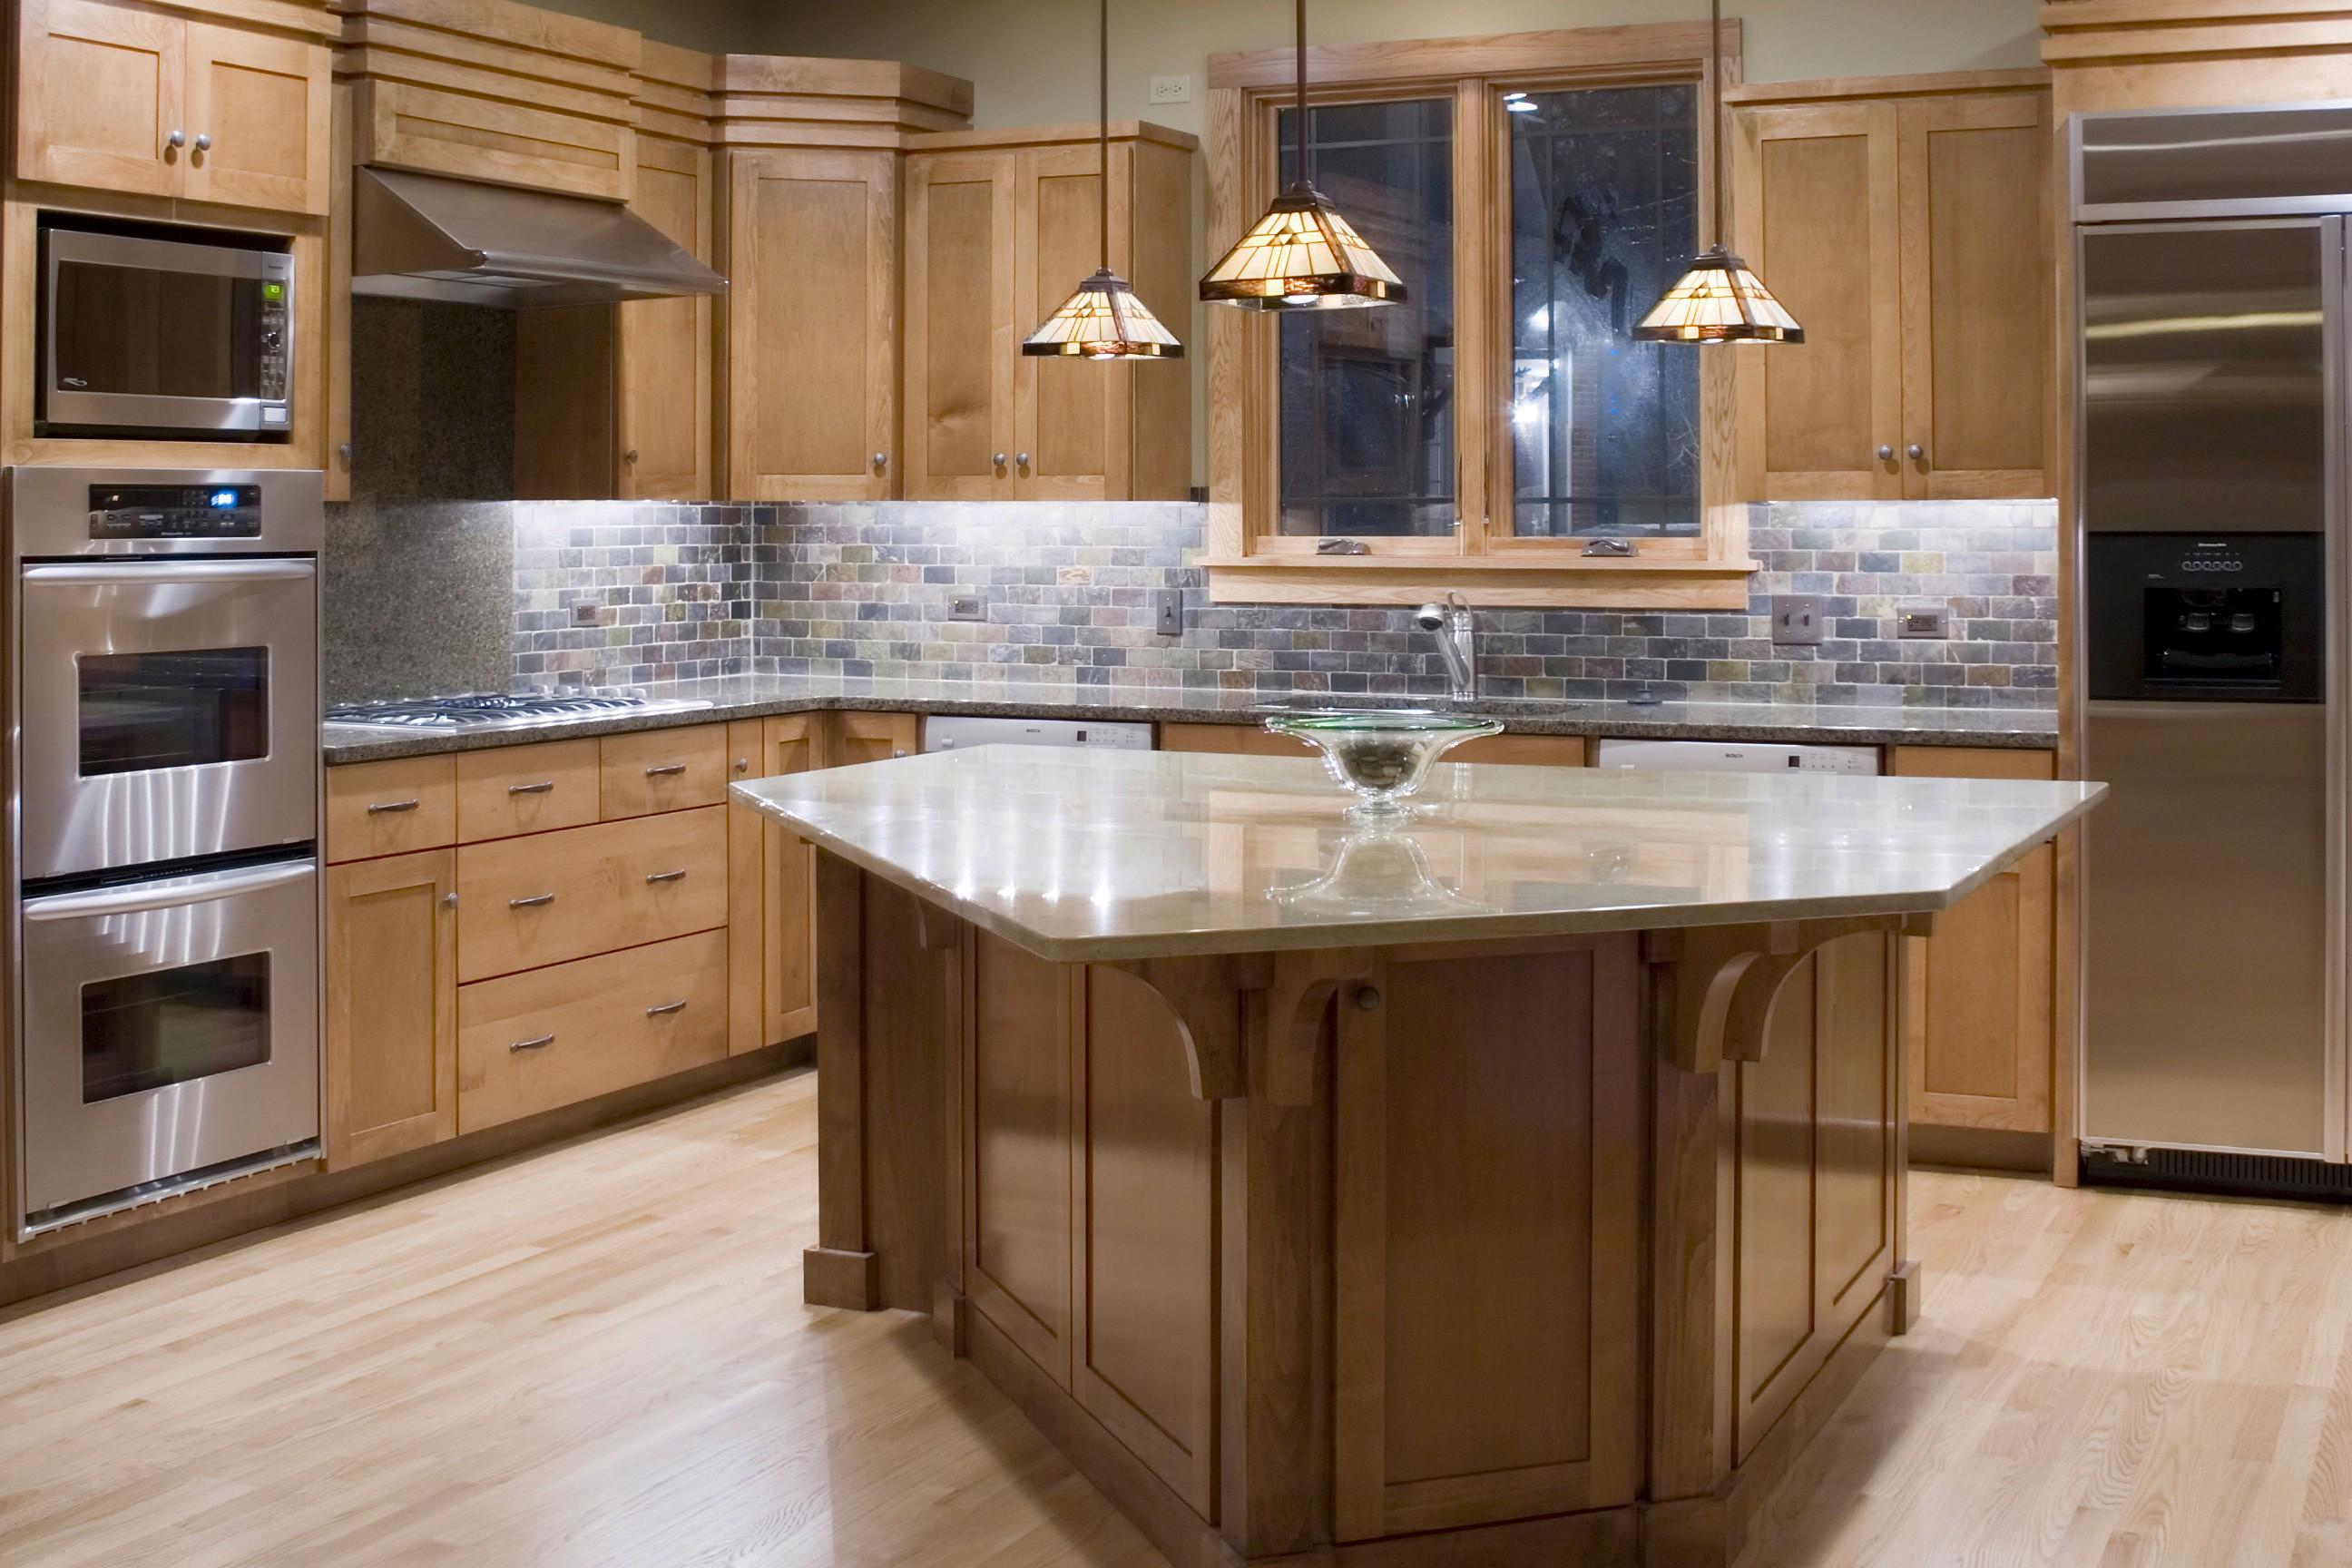 Transitional Kitchen Designs - Sunrise Kitchens Transitional